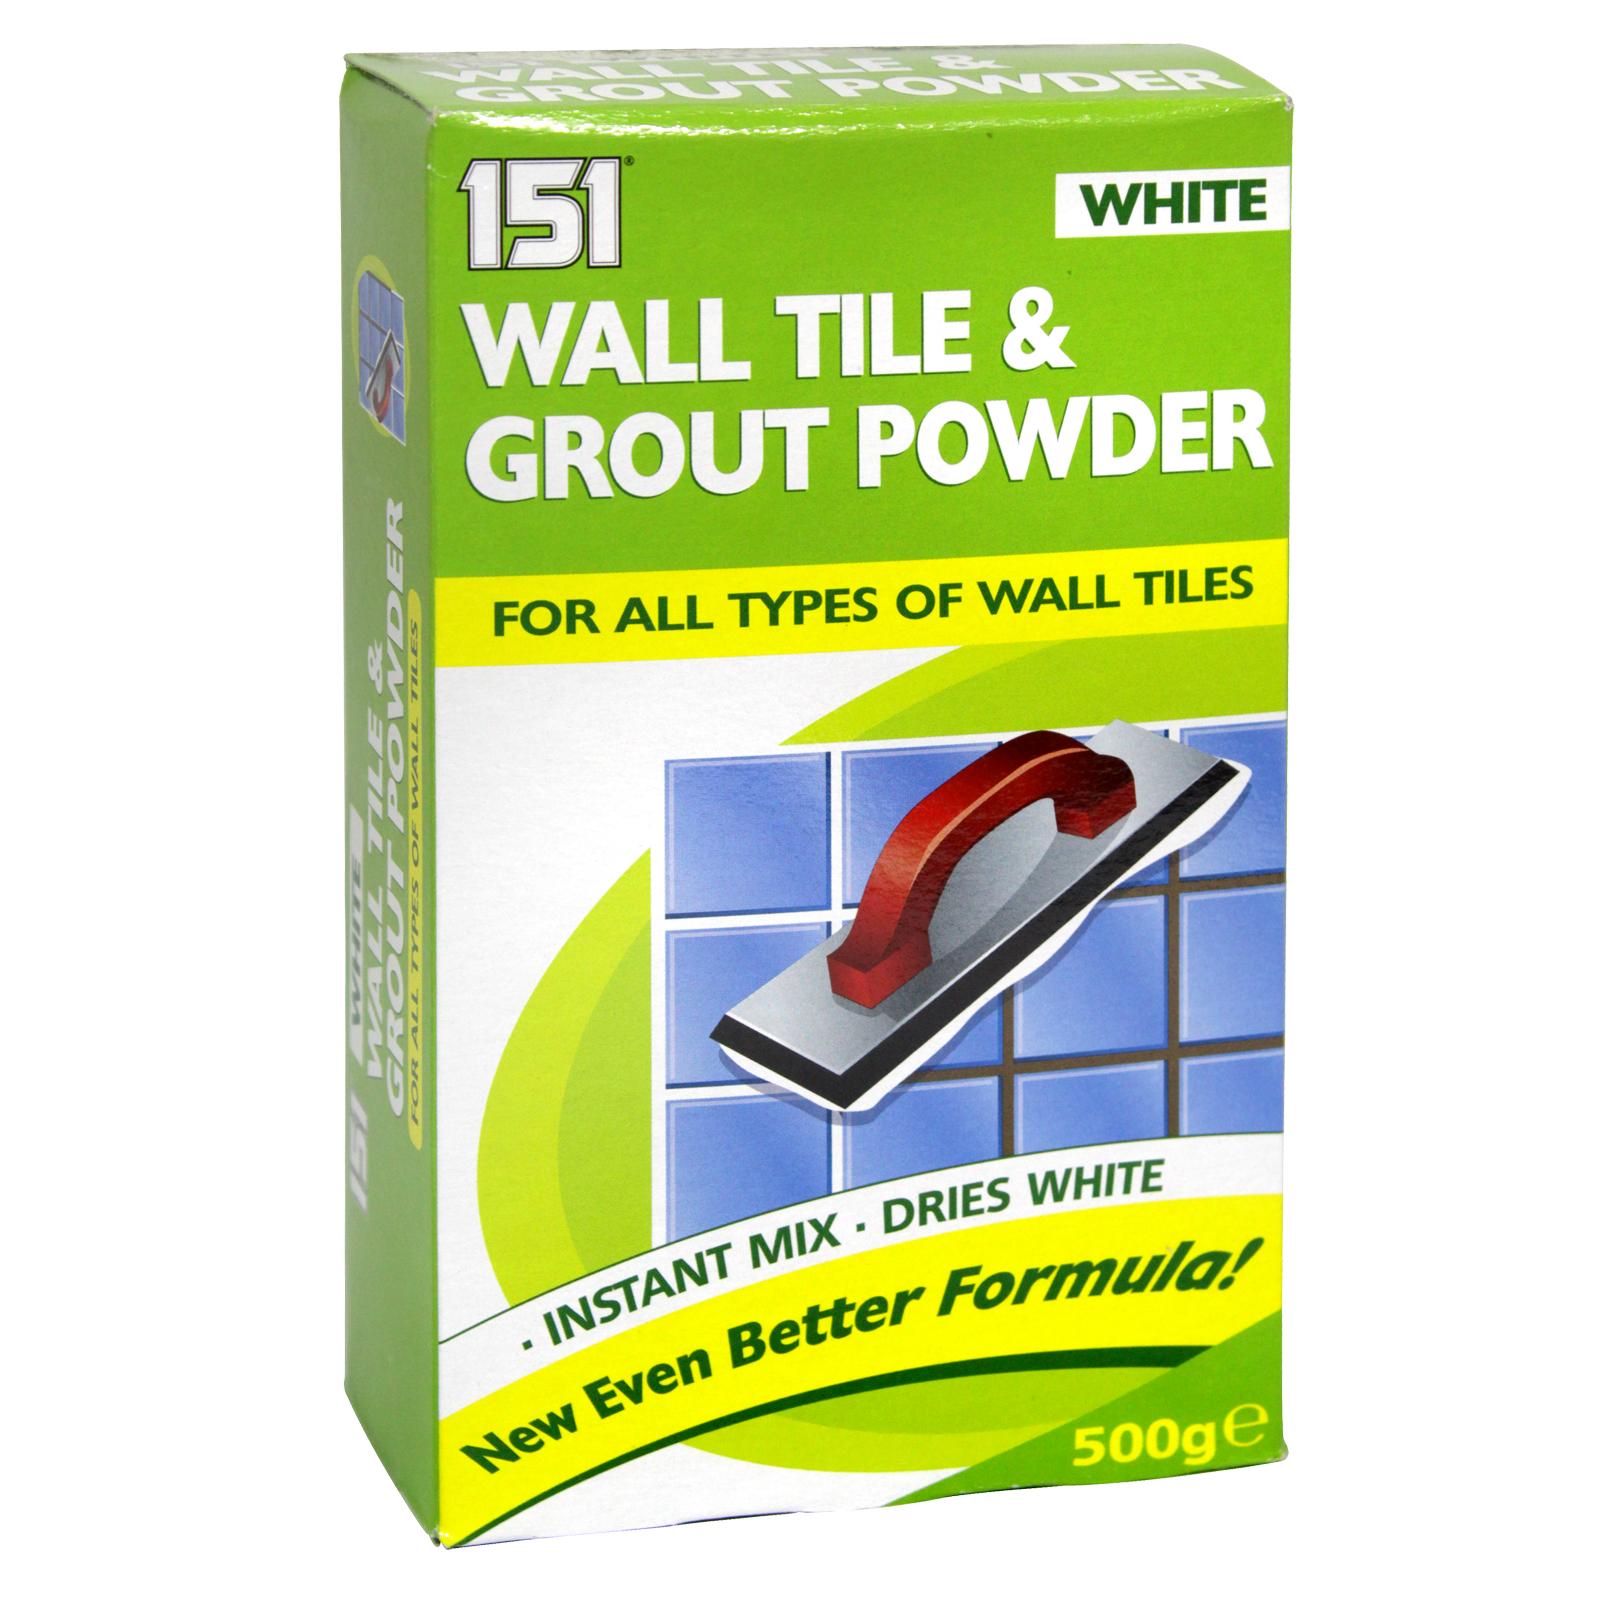 151 WALL TILE & GROUT POWDER WHITE 500G